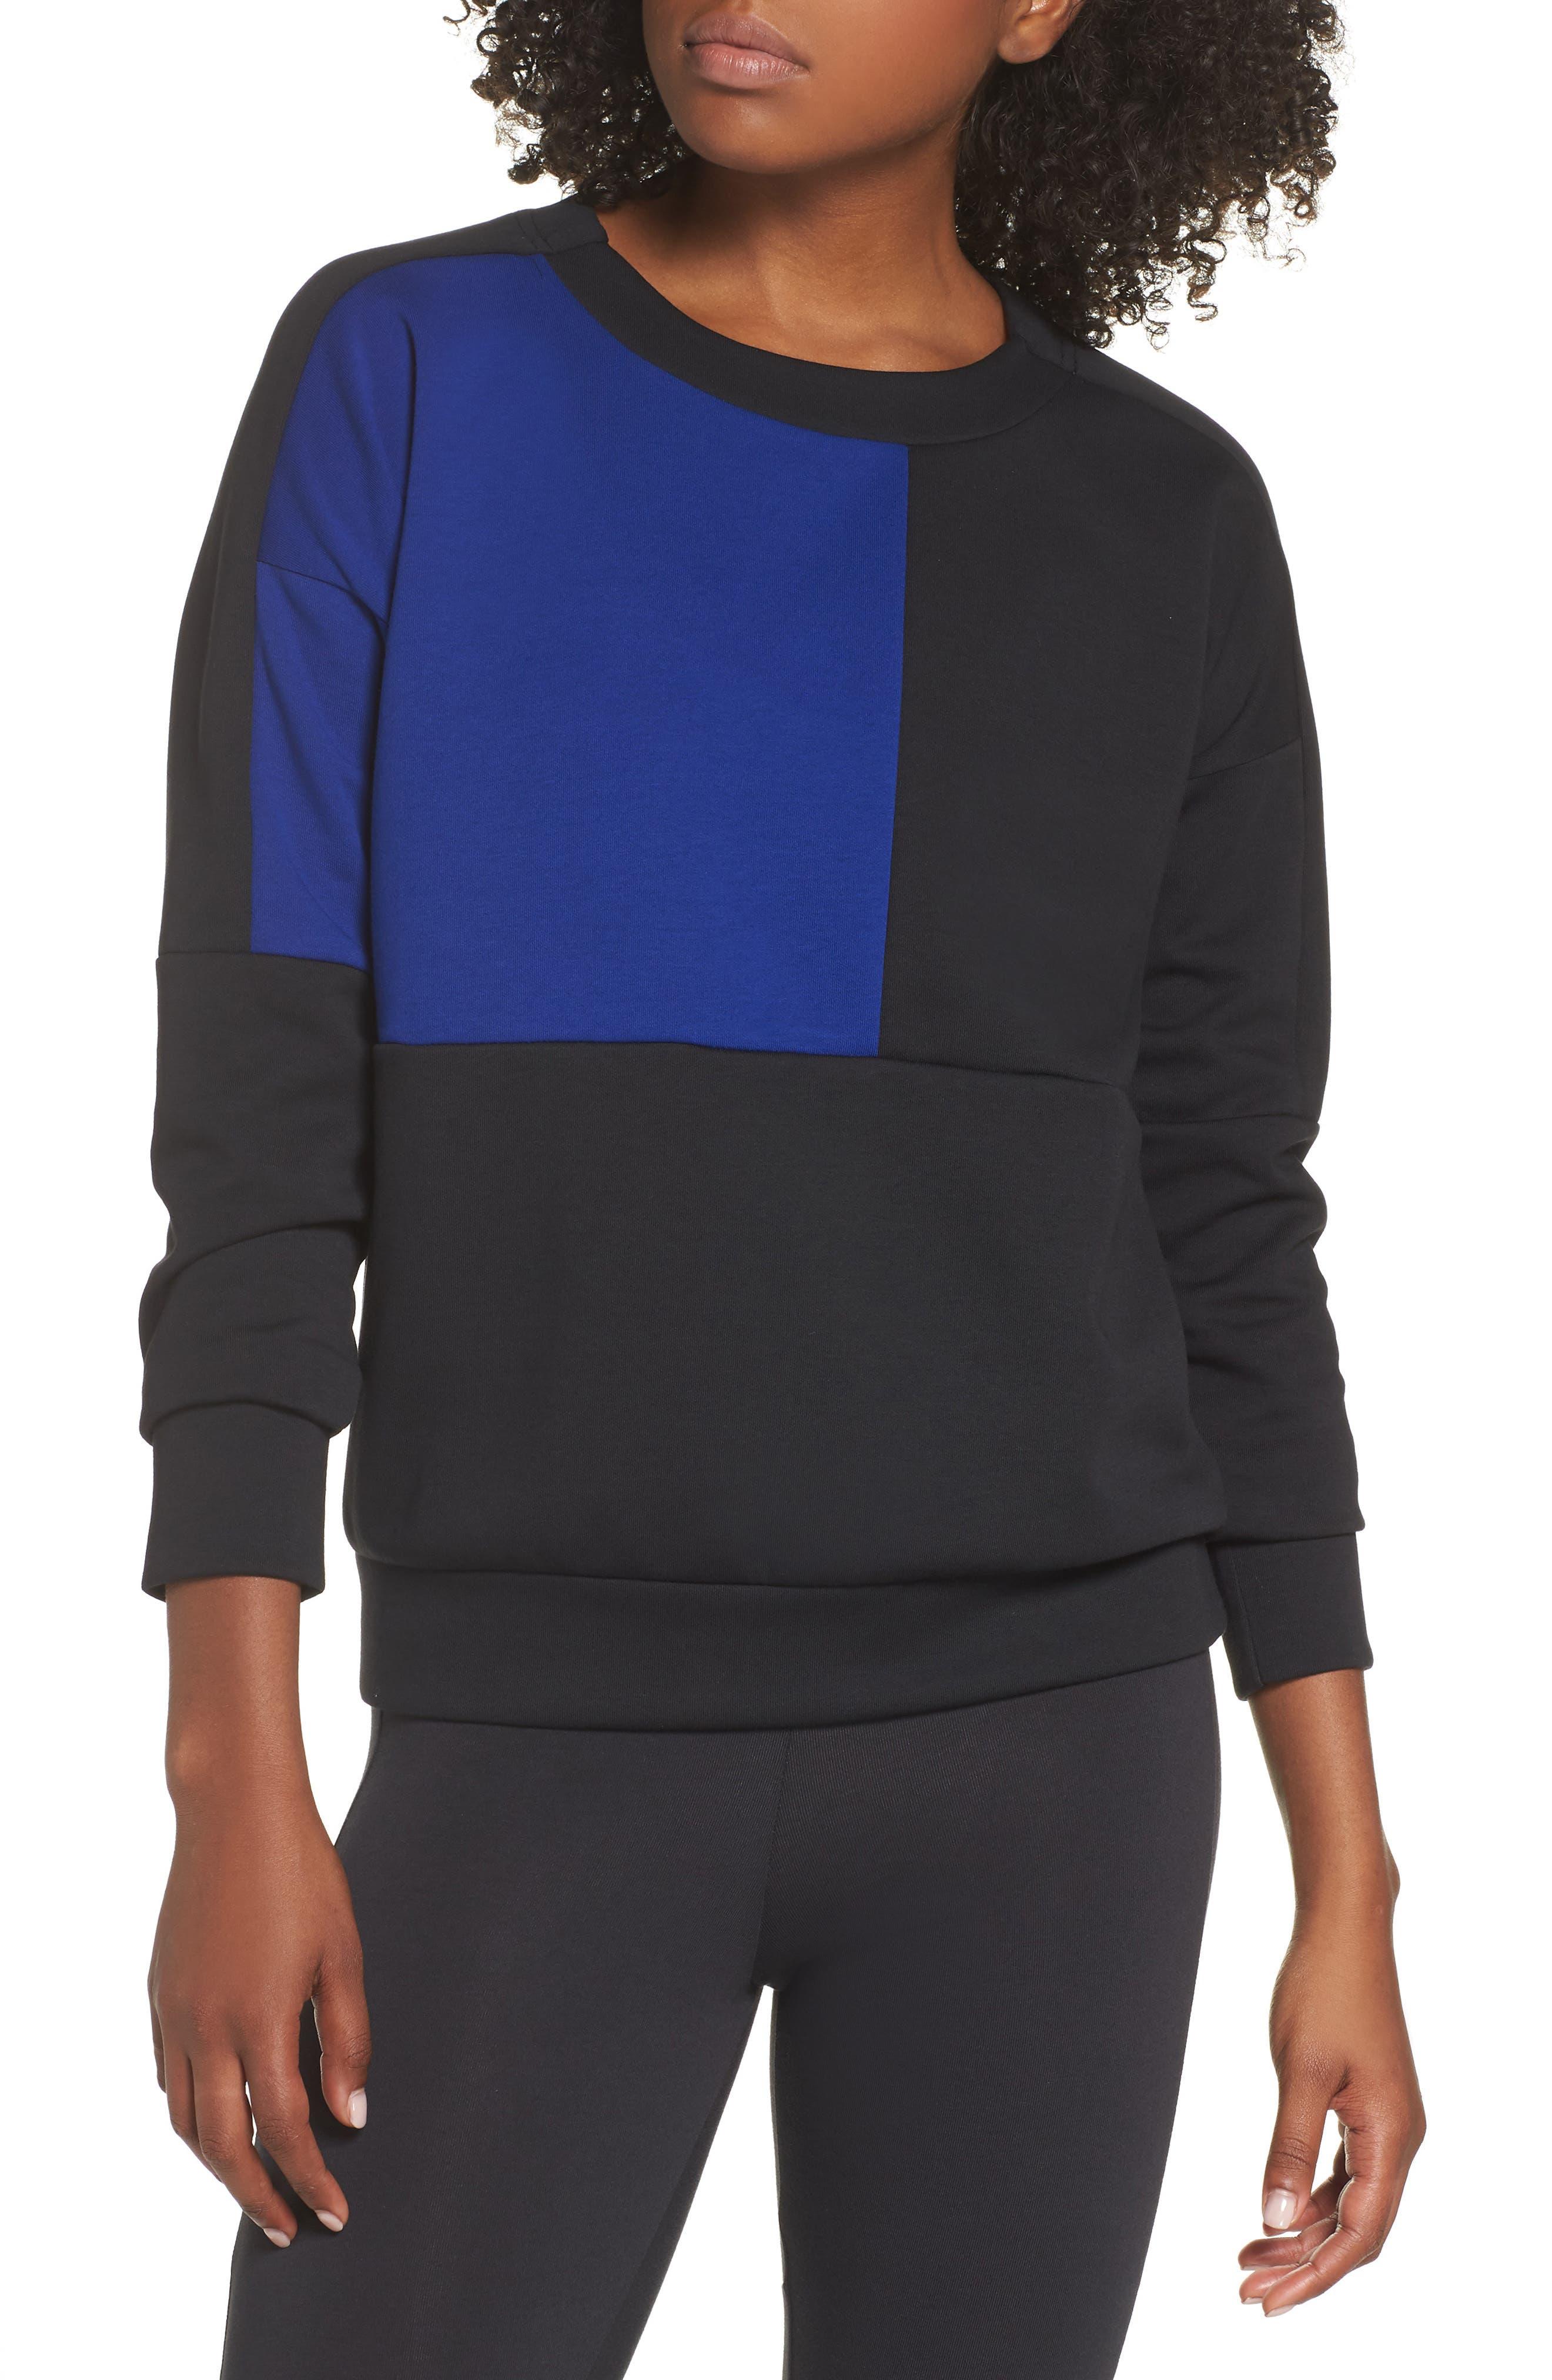 adidas all women nordstrom  adidas id glory colorblock crewneck sweatshirt